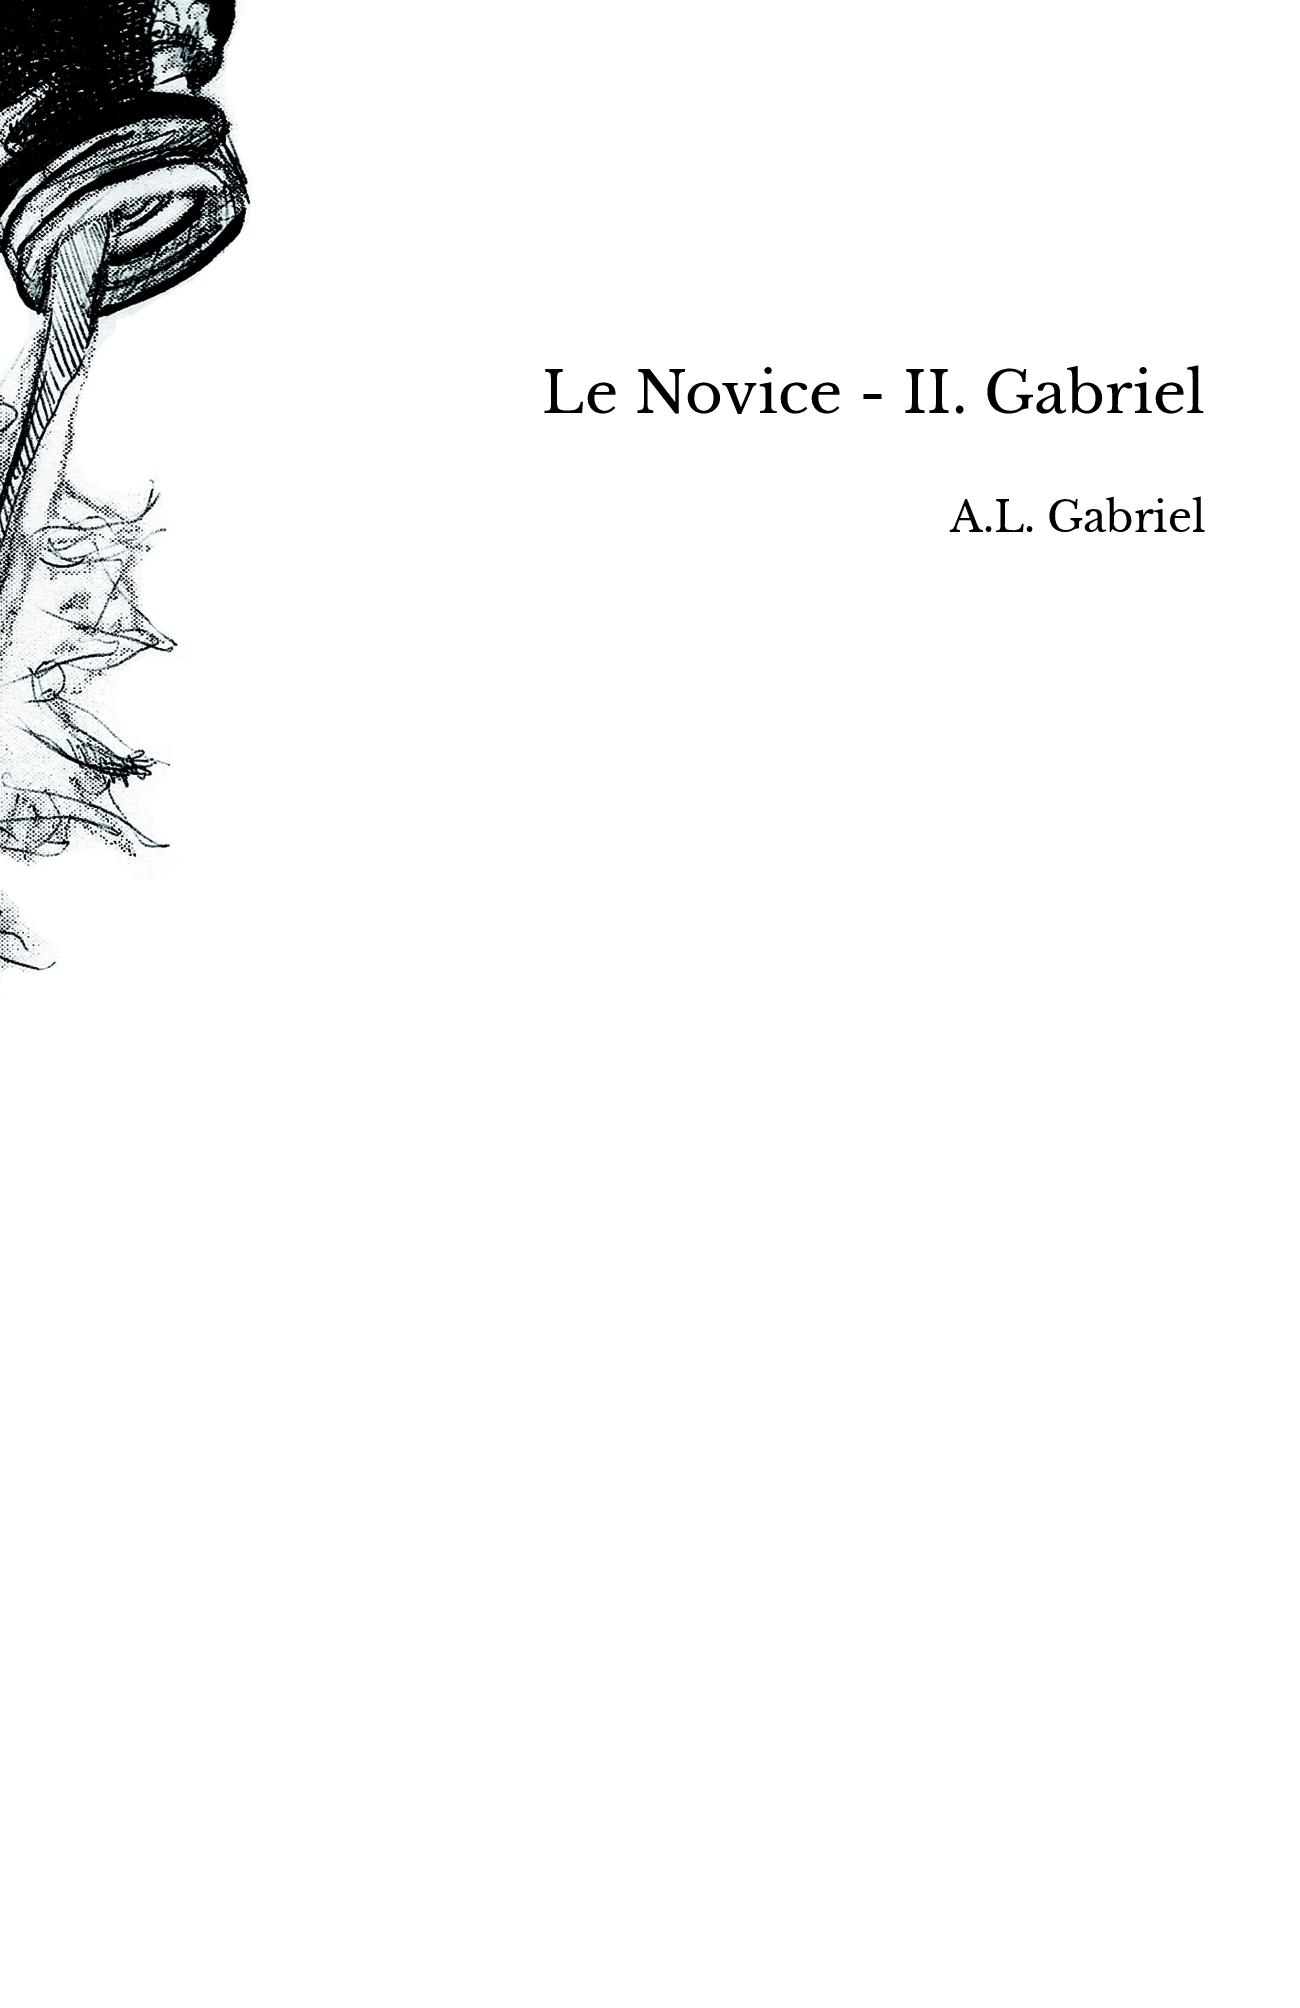 Le Novice - II. Gabriel